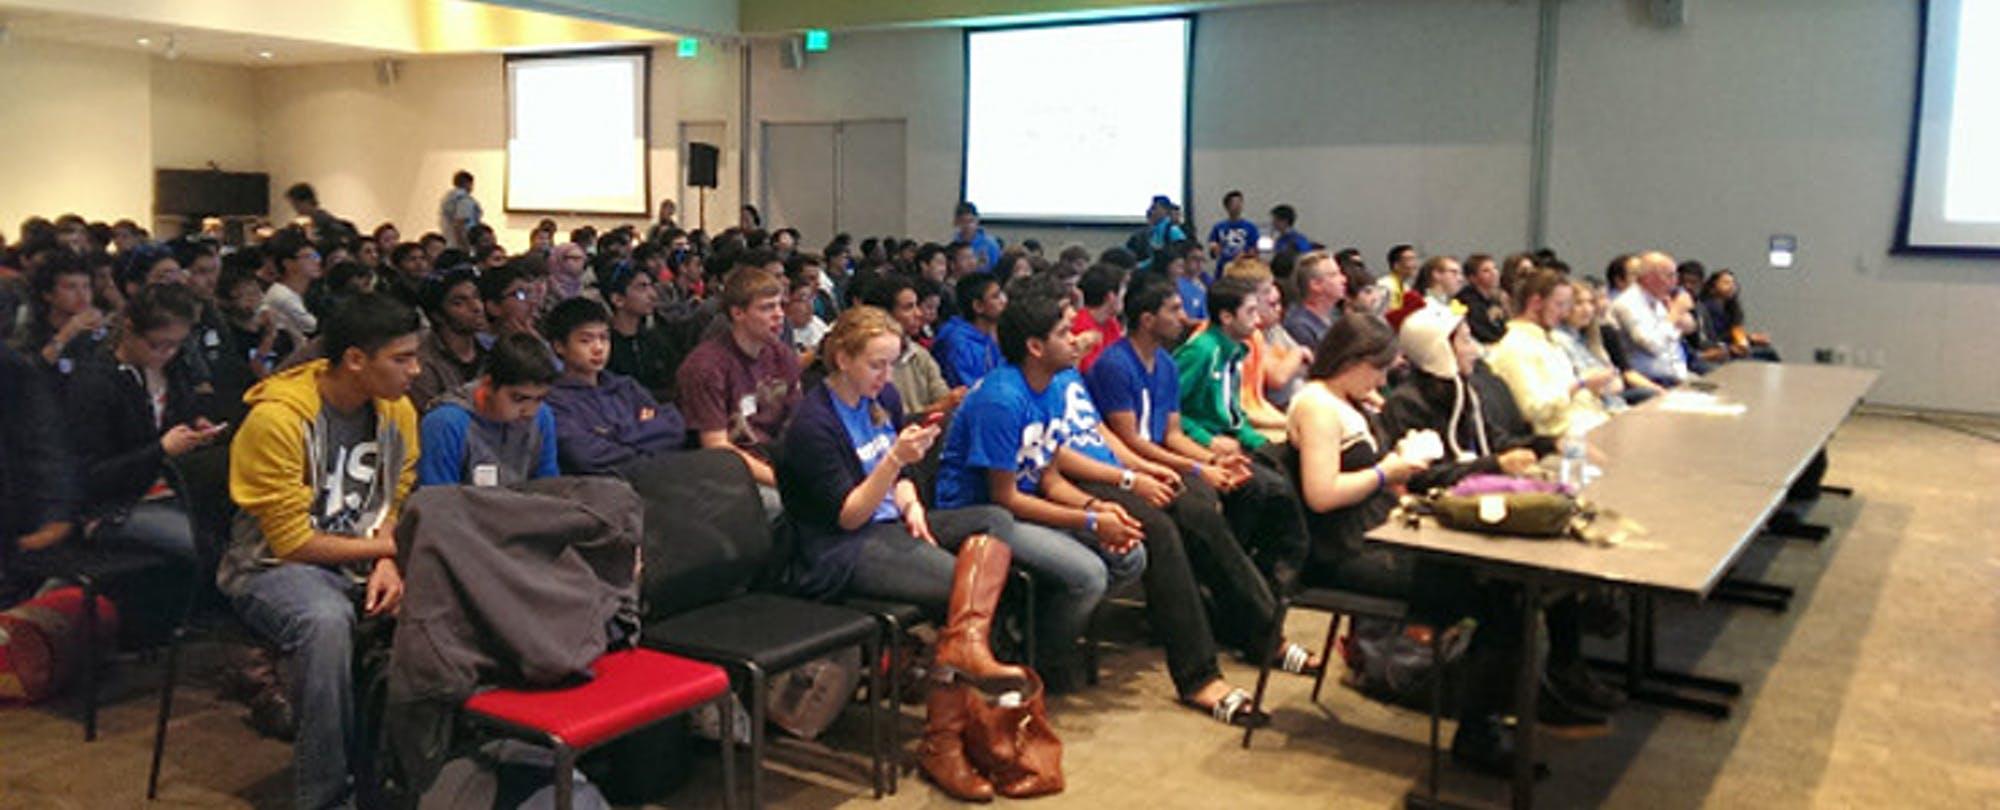 Inside the High School Hackathon Scene